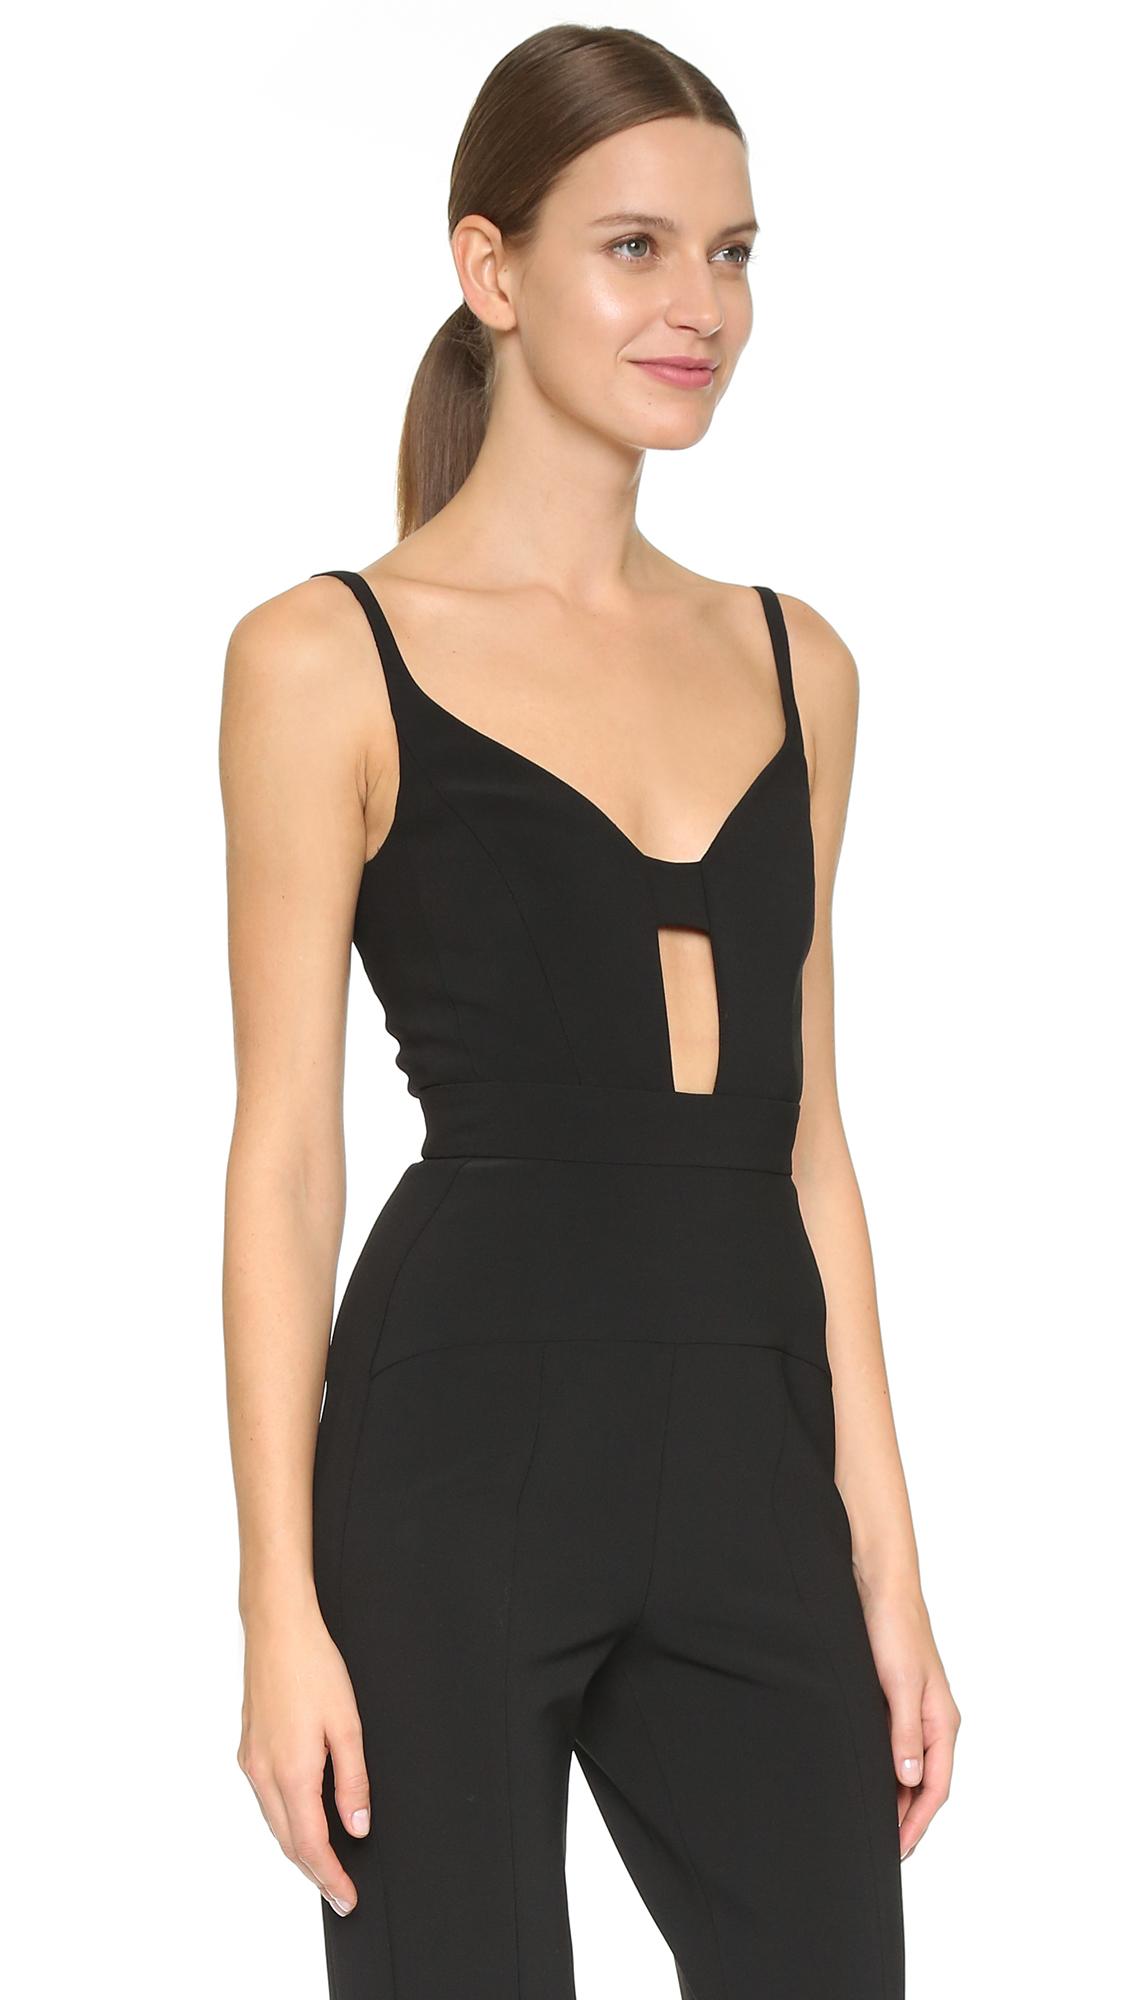 a90f9cb5fbd4 Lyst - Narciso Rodriguez Scuba Crepe Jumpsuit - Black in Black